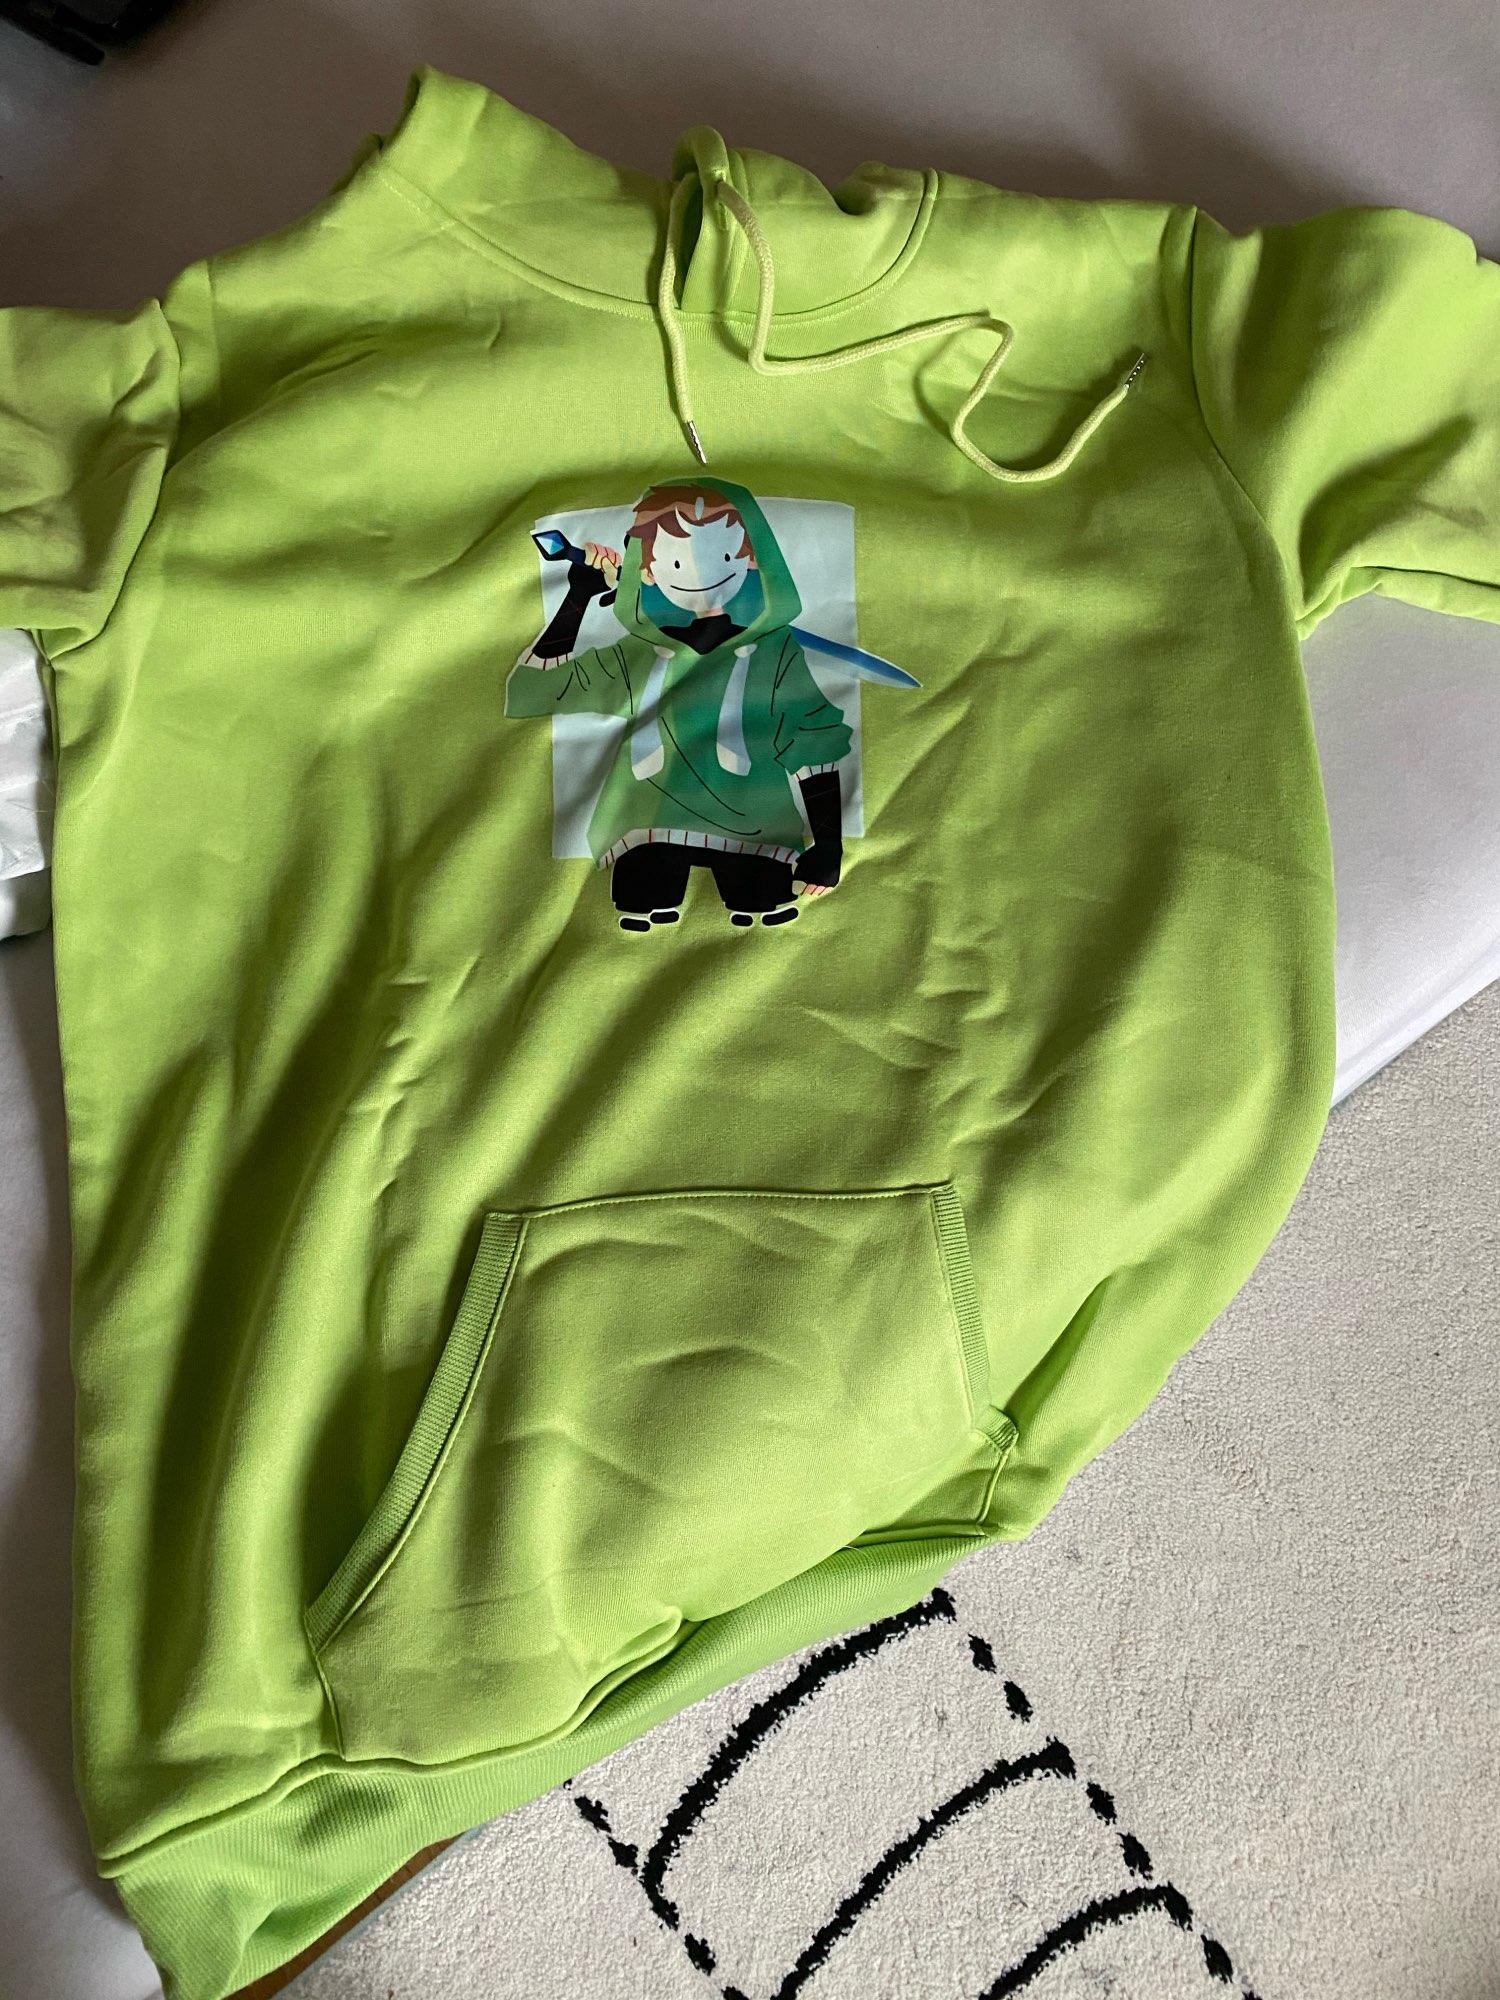 Dream Smp Hoodie Green Merch Con Capucha Sweatshirt Women/Men Smile Boys Take The Sword Pirnt Sudaderas Unisex Tops Nuevas Larga photo review